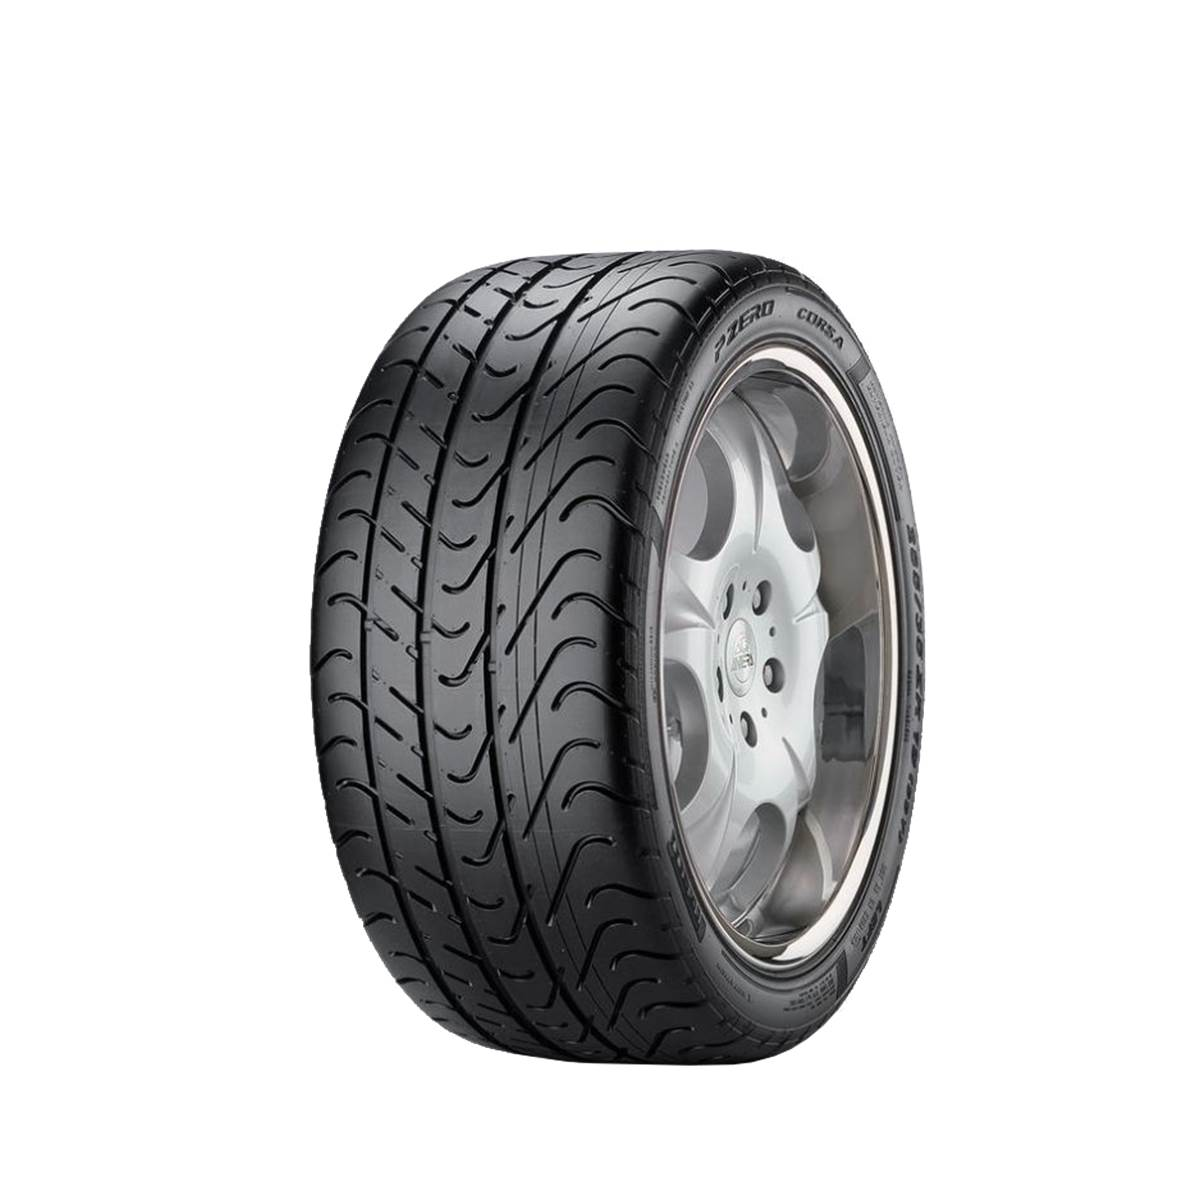 Pneu Pirelli 245/35R19 93Y Pzero Corsa Asimmetrico 2 XL